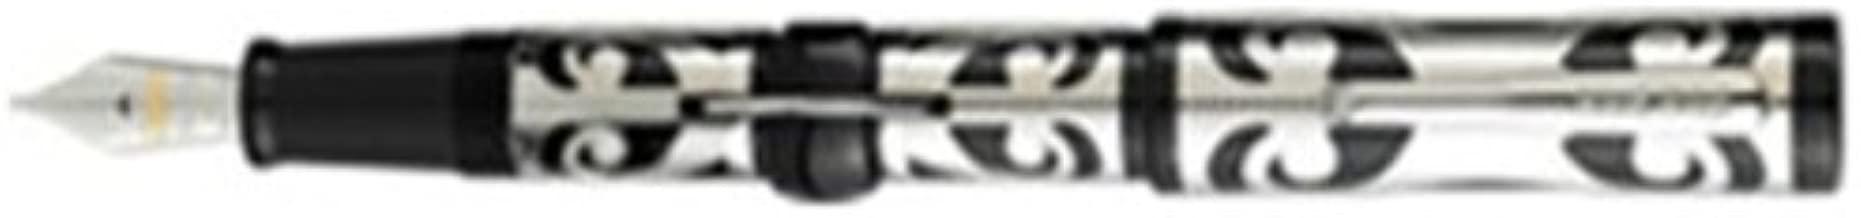 Conklin Deco Crest Mark Twain Limited Edition Sterling Silver Overlay Fountain Pen-Medium